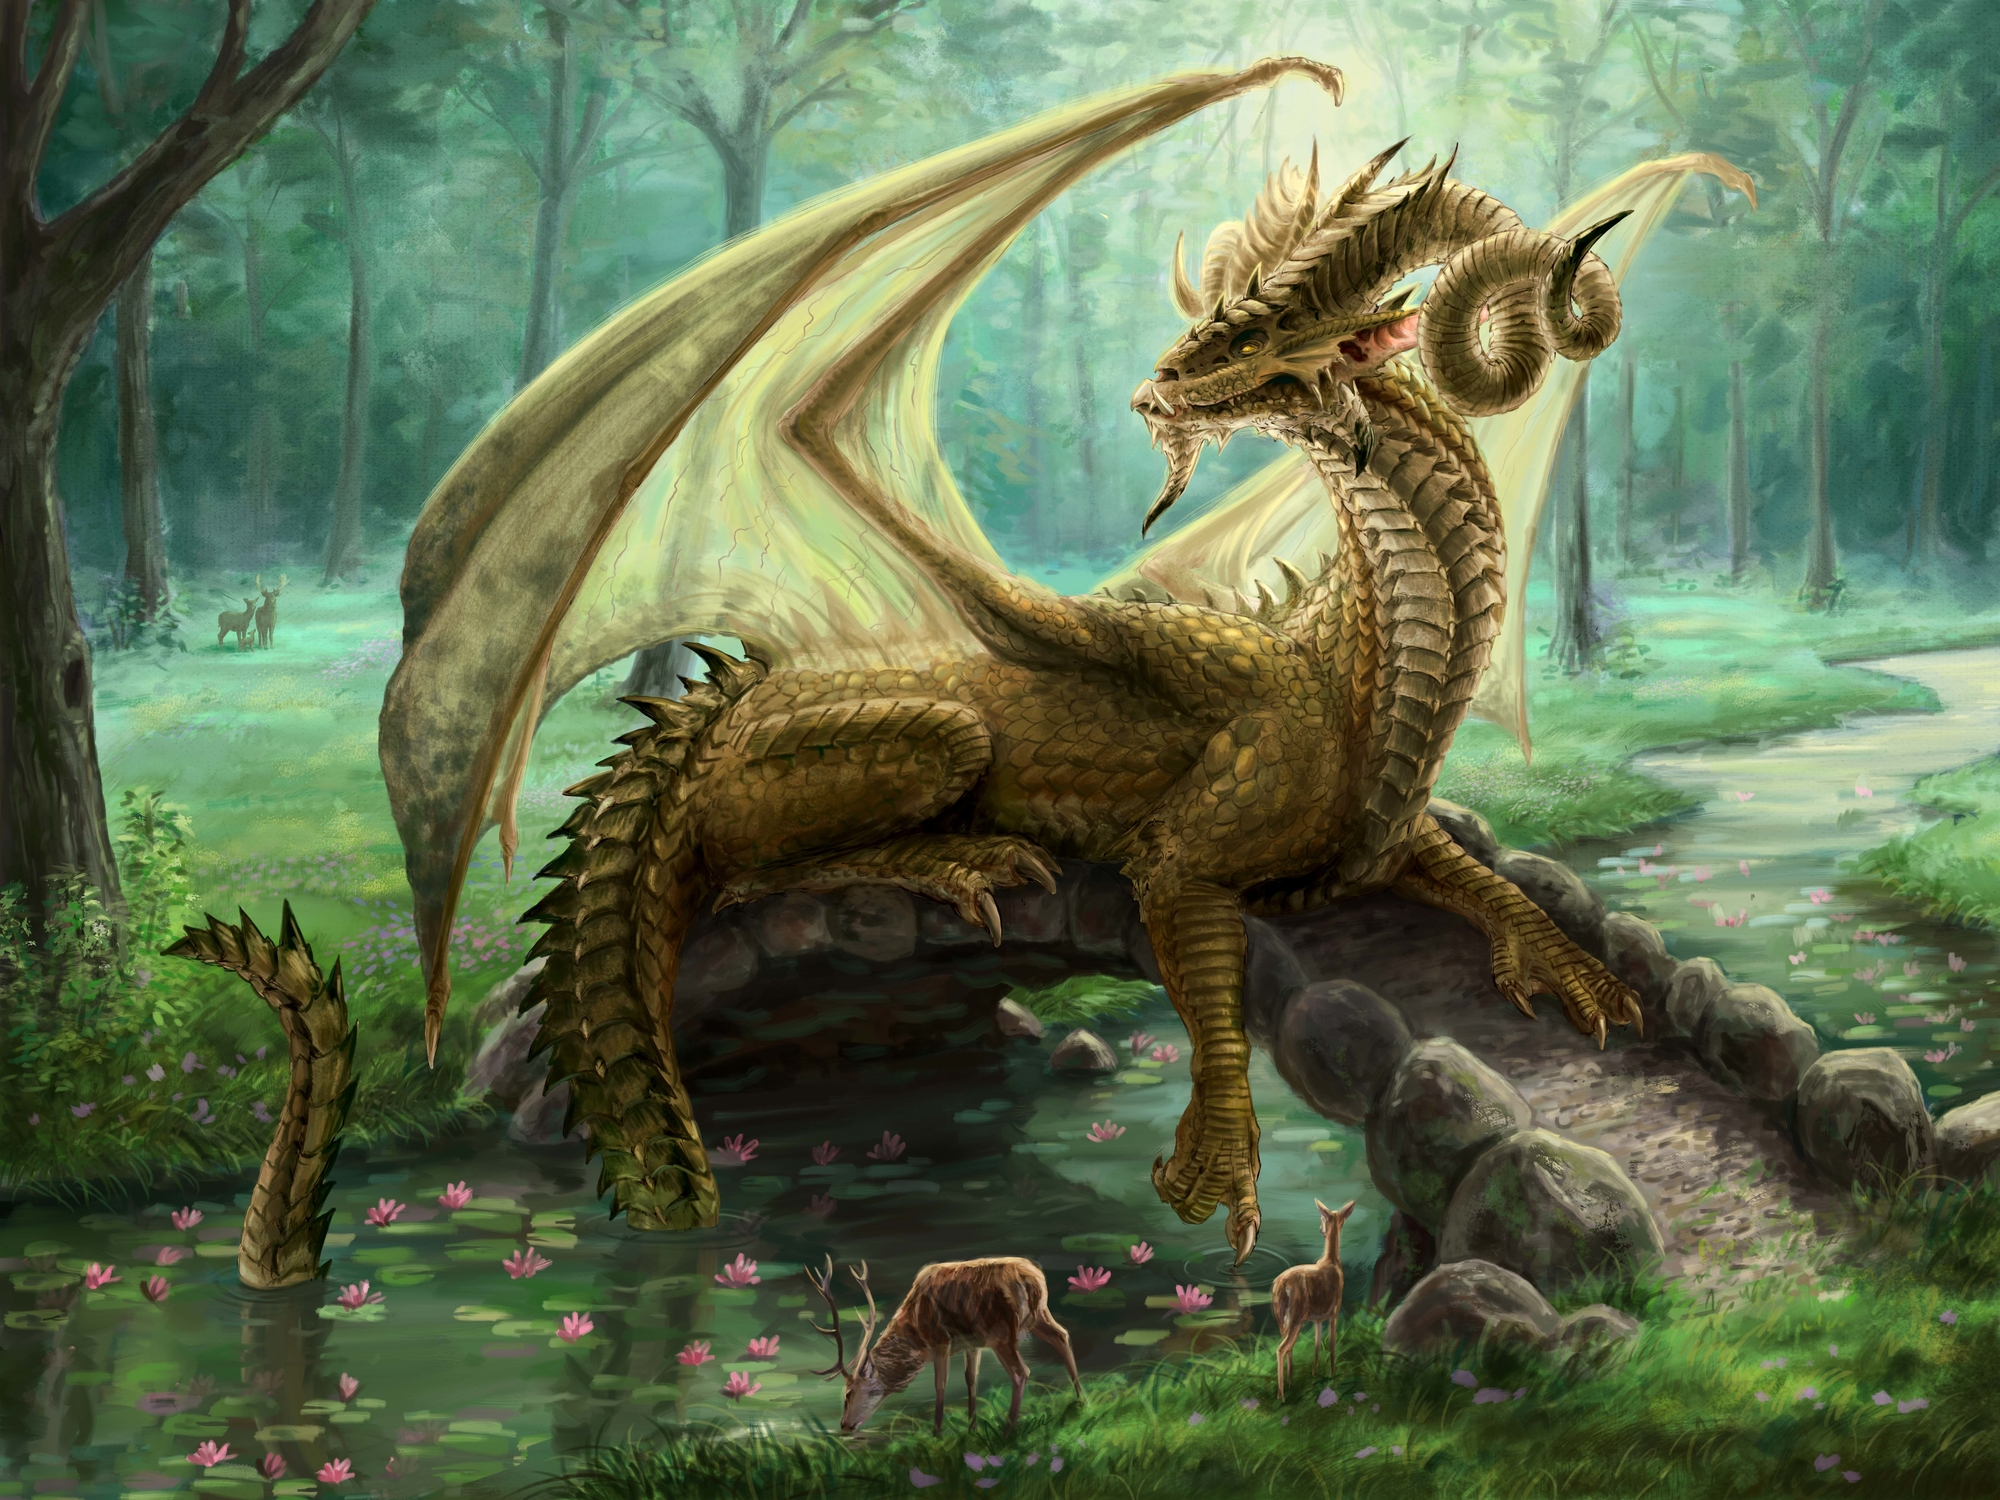 Forest King Artwork by Elissa  Weaver